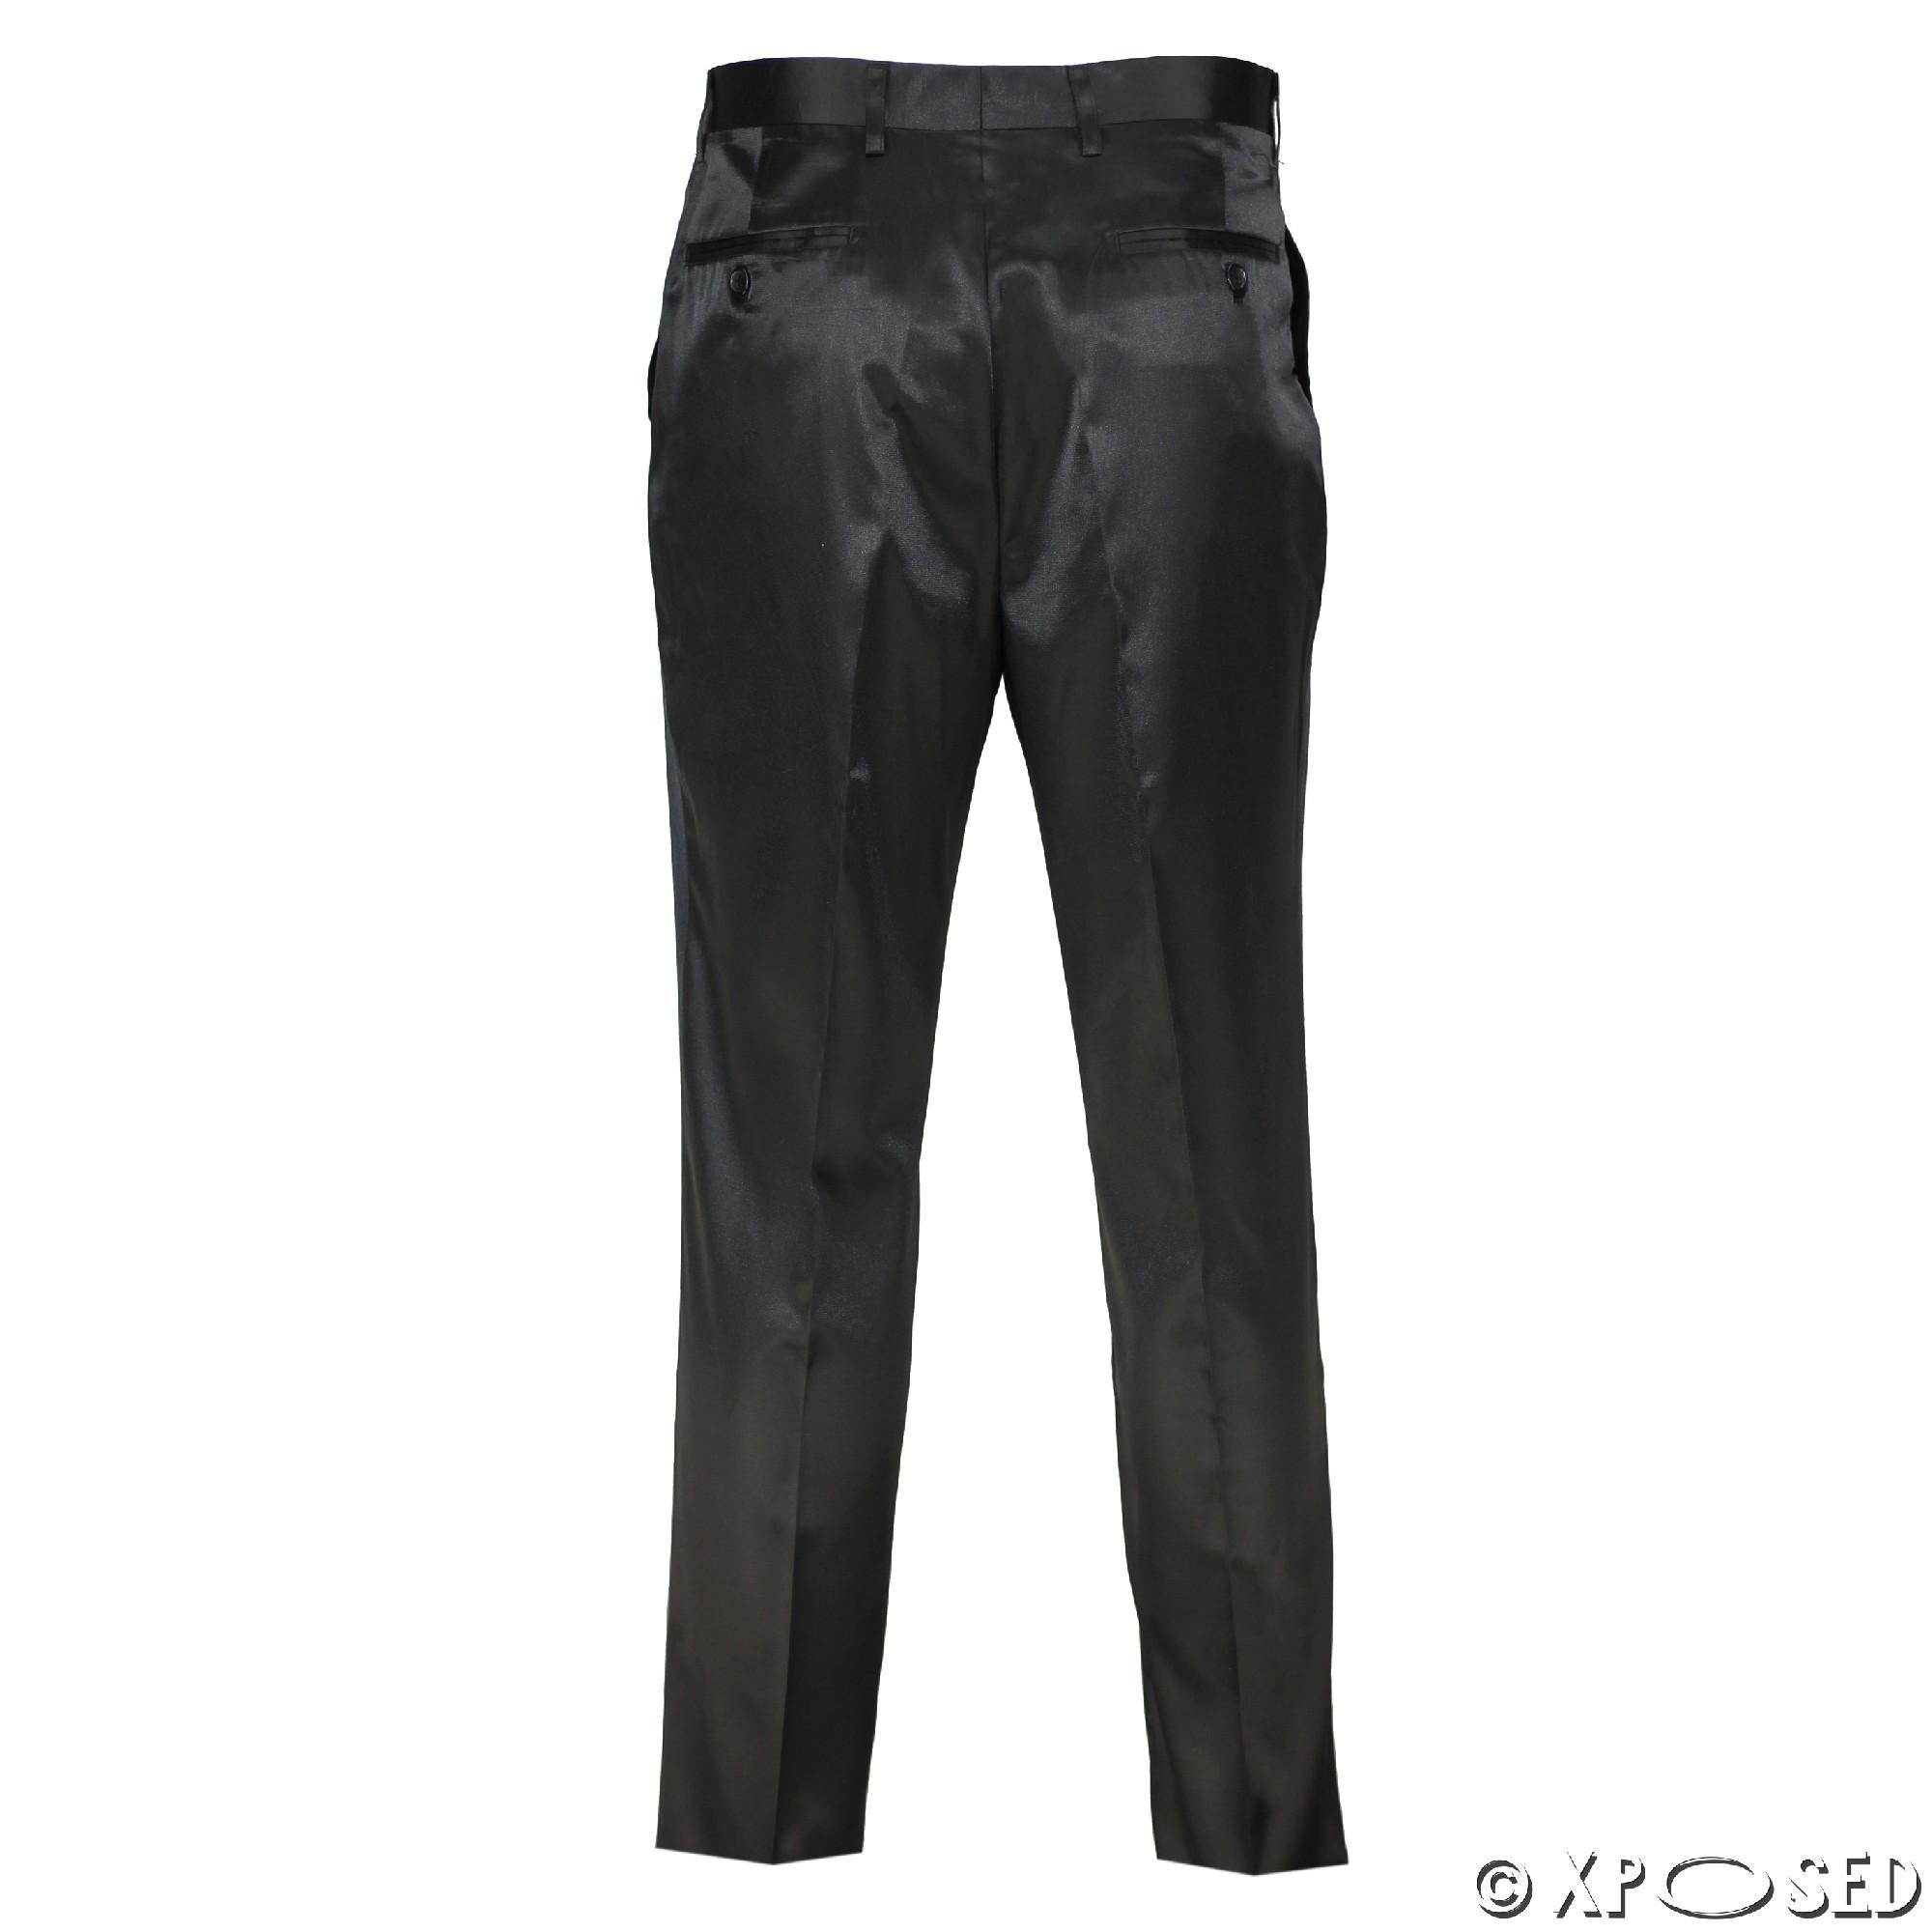 4971834cbf Mens Silky Feel Satin Shiny Black Slim Fit Trousers Party Weeding ...